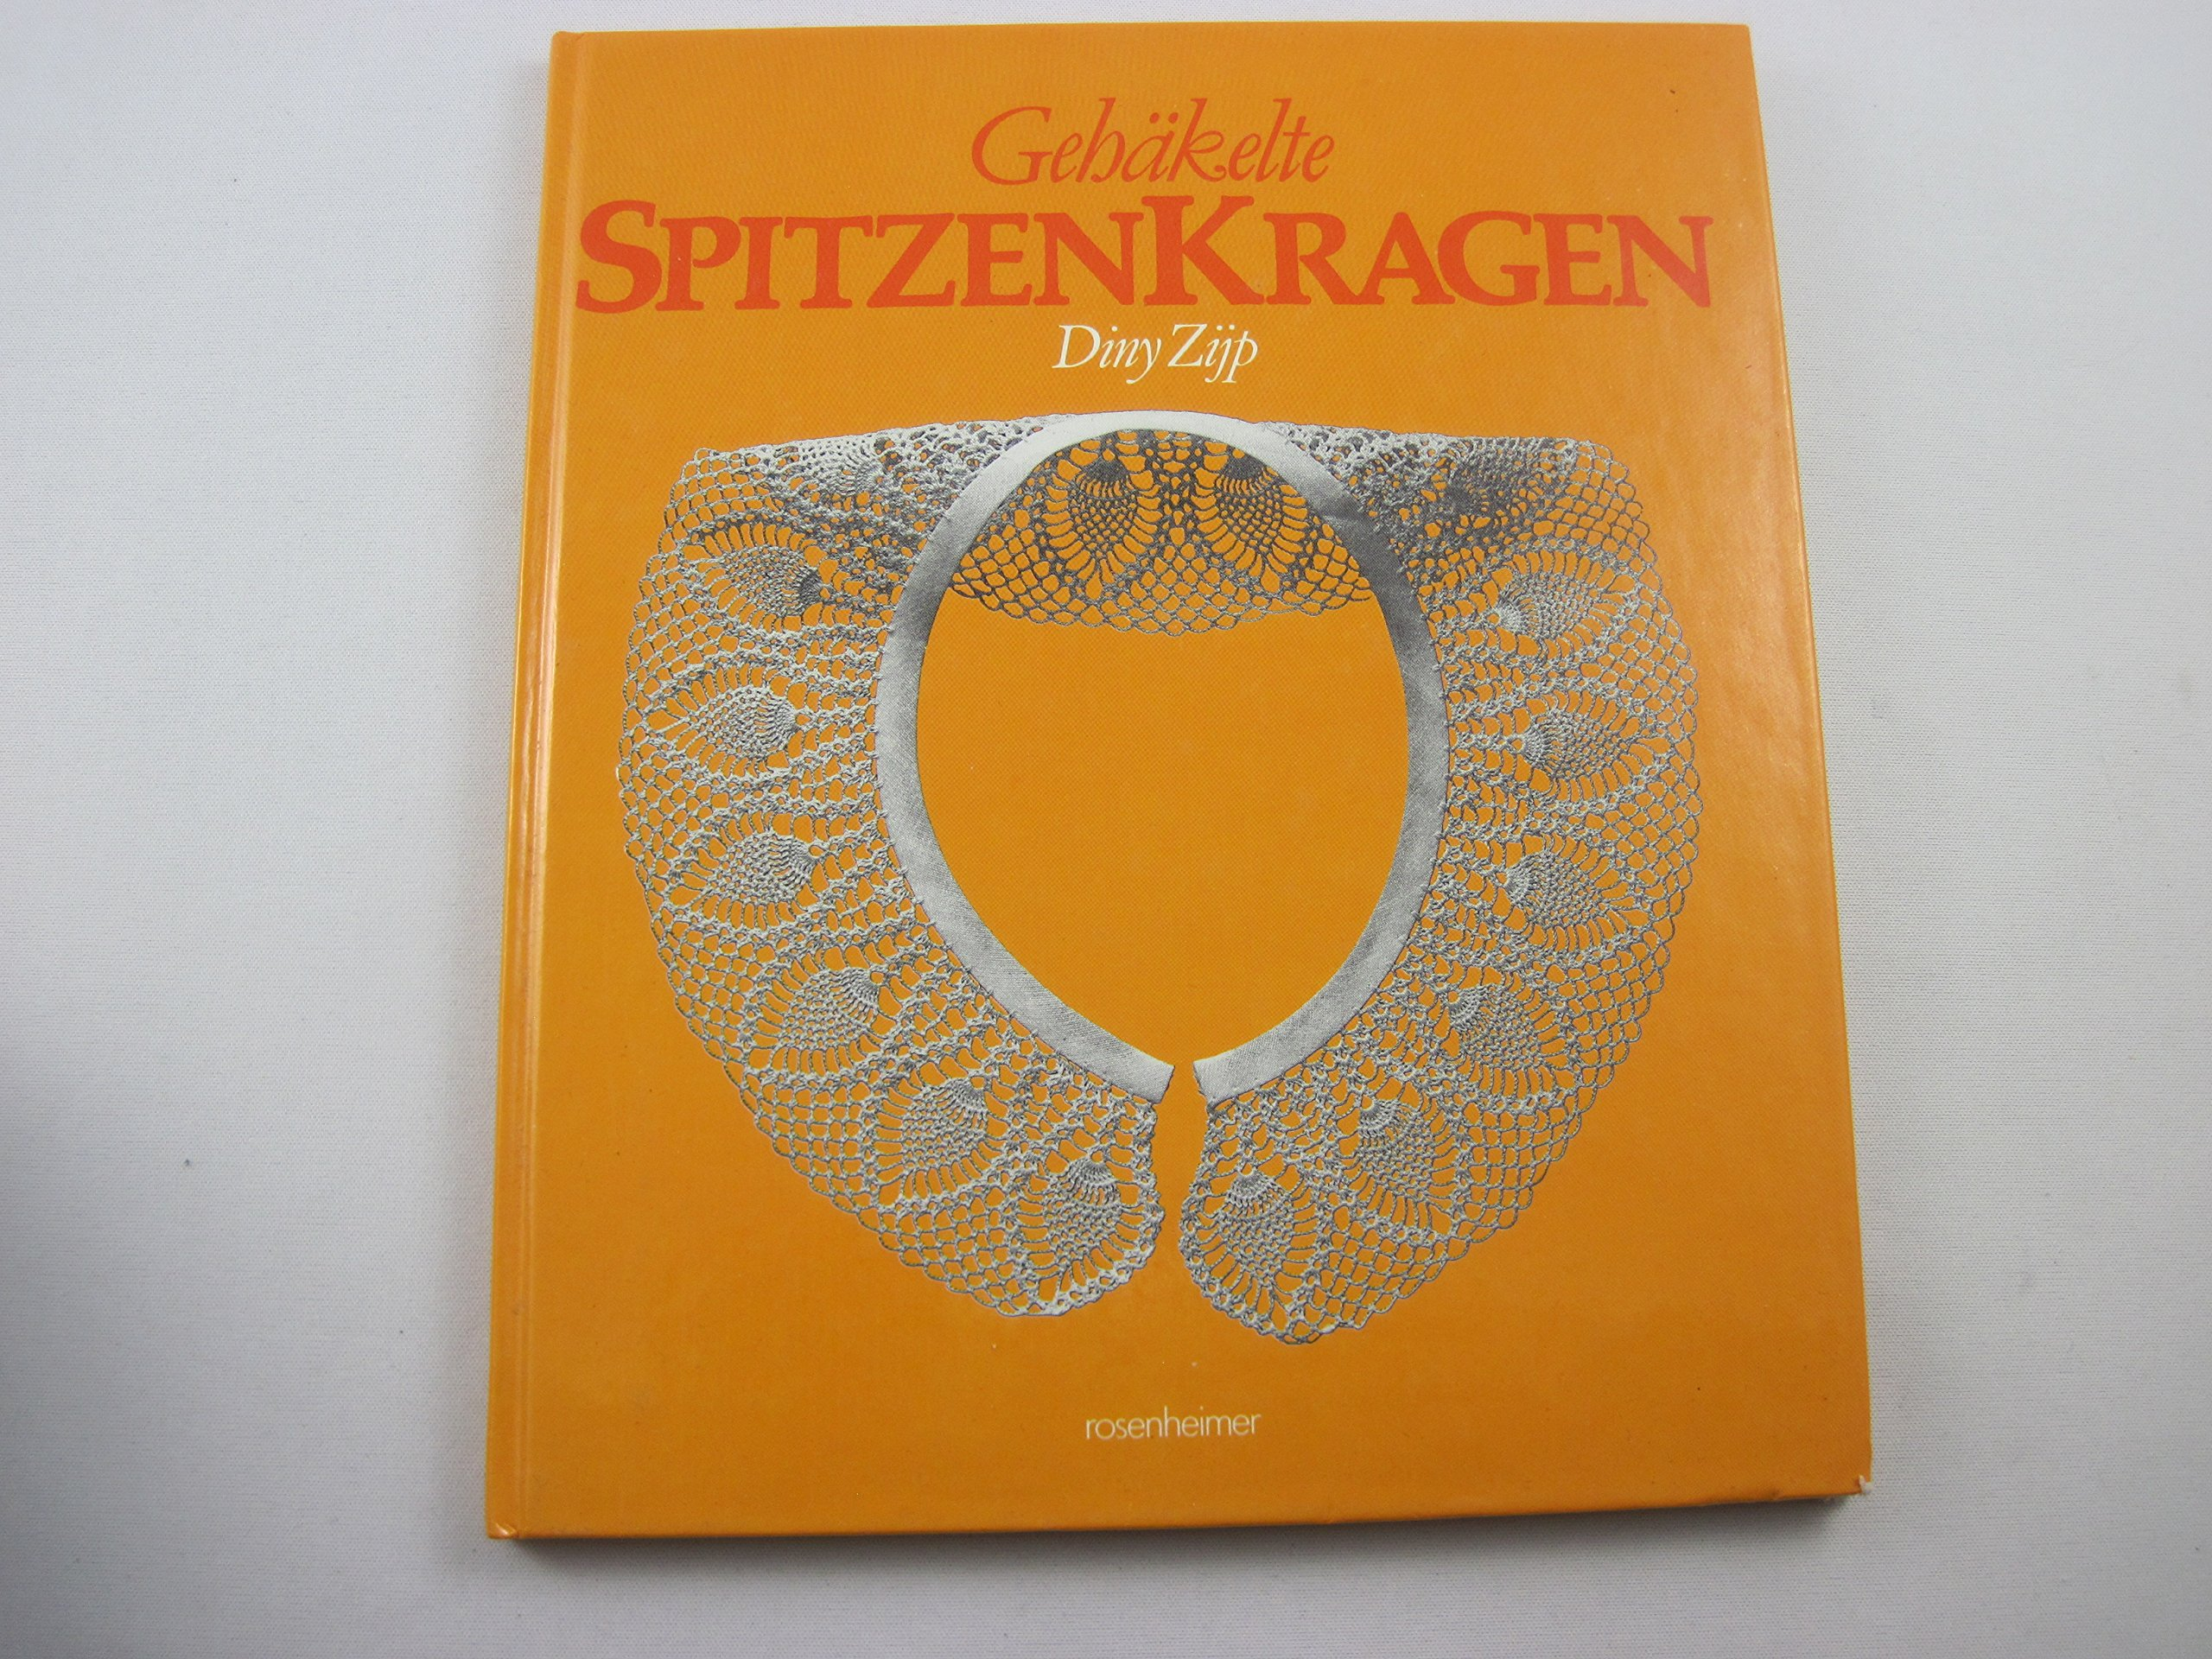 Gehäkelte Spitzenkragen Amazonde Diny Zijp Bücher